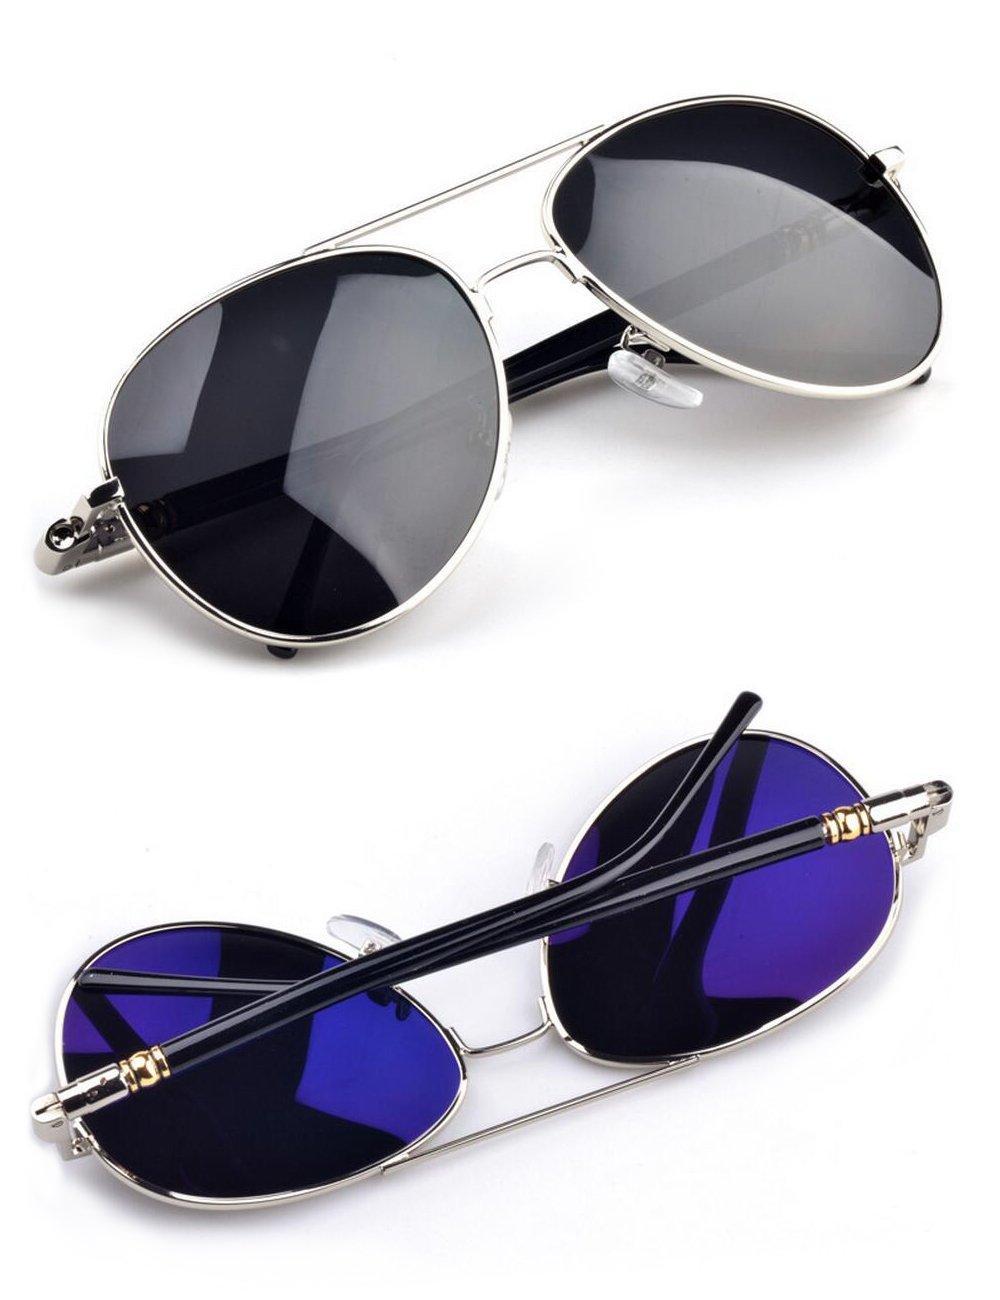 IALUKU Classic Aviator Polarized Sunglasses For Women Men Pilot Coating Lens